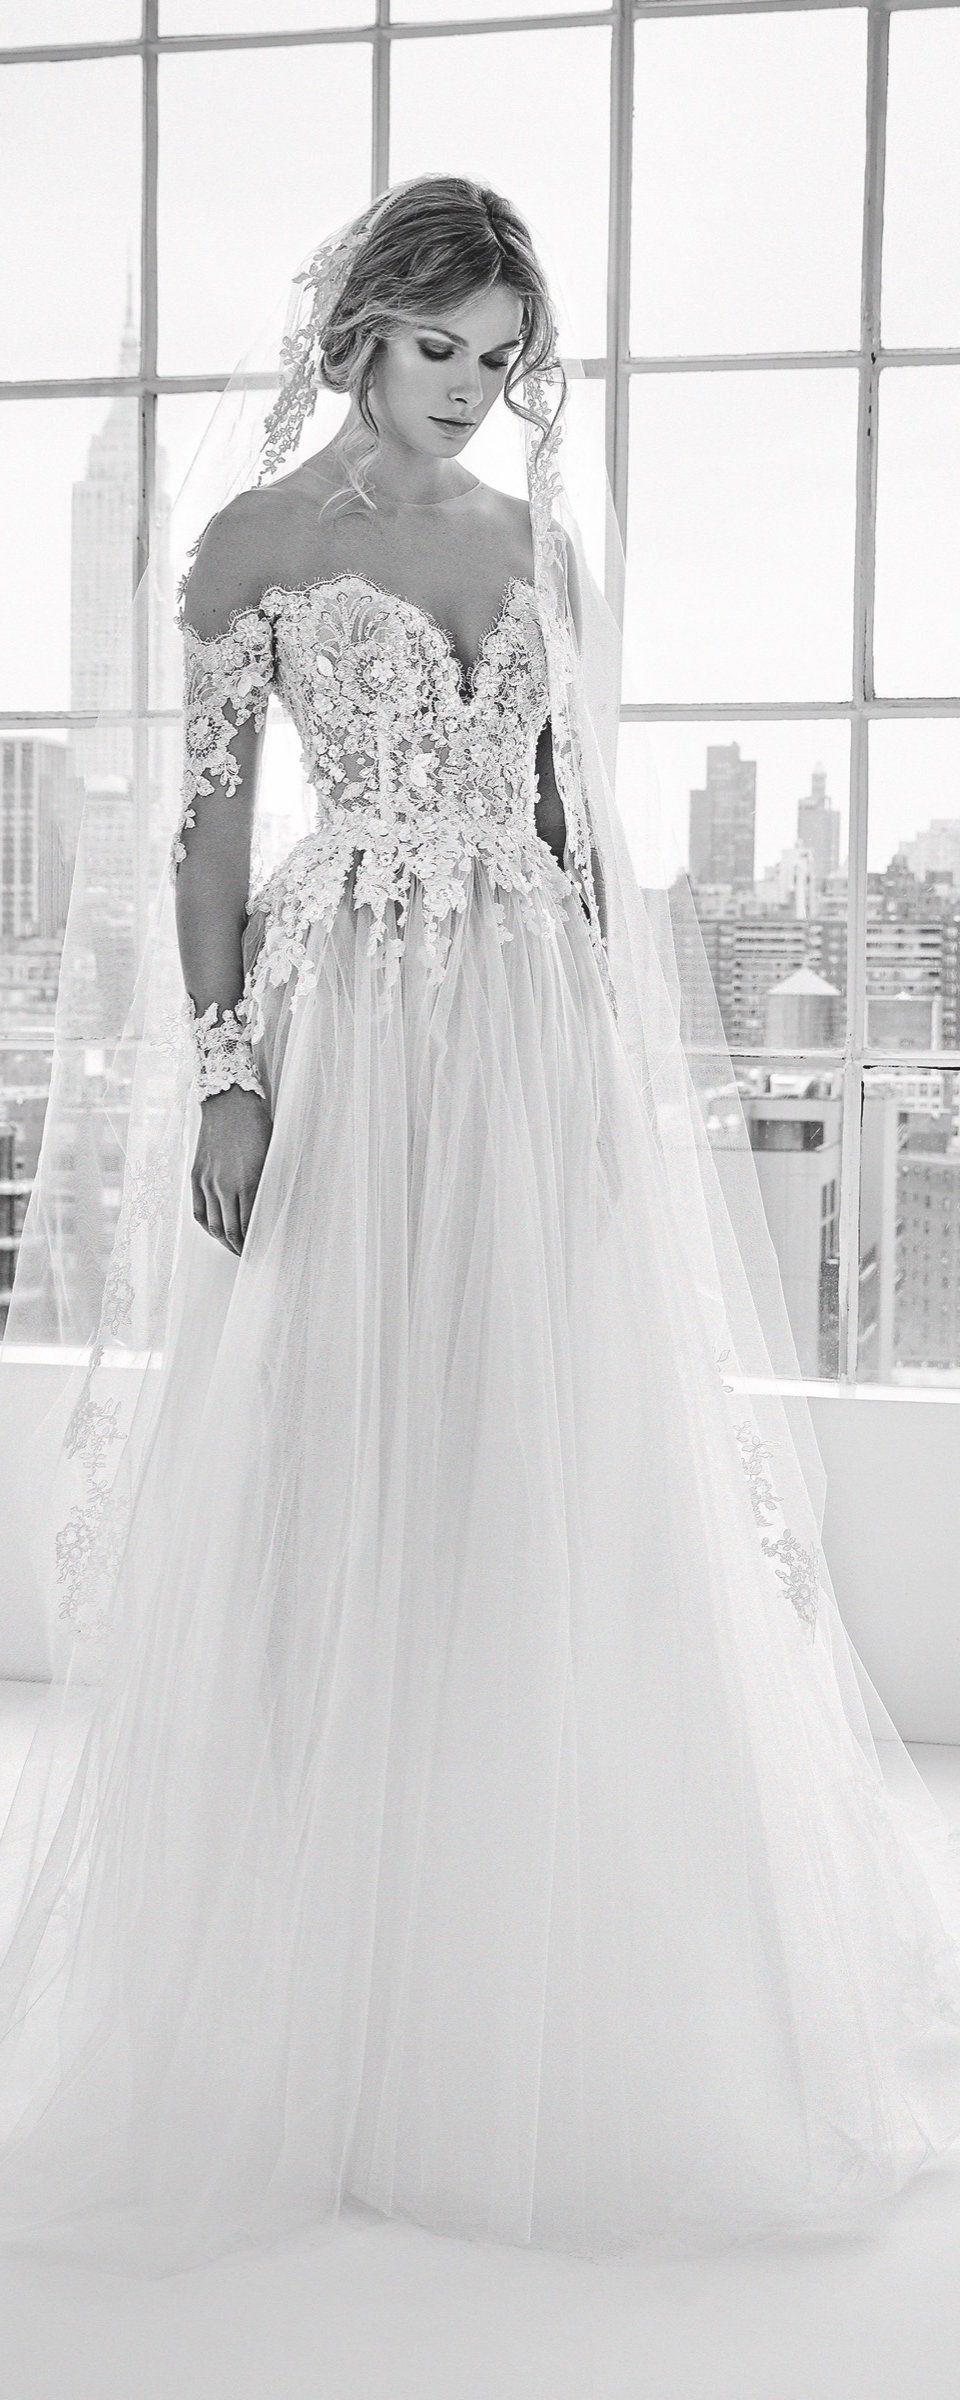 Wedding dresses com  Zuhair Murad Springsummer   Bridal  Zuhair murad Wedding